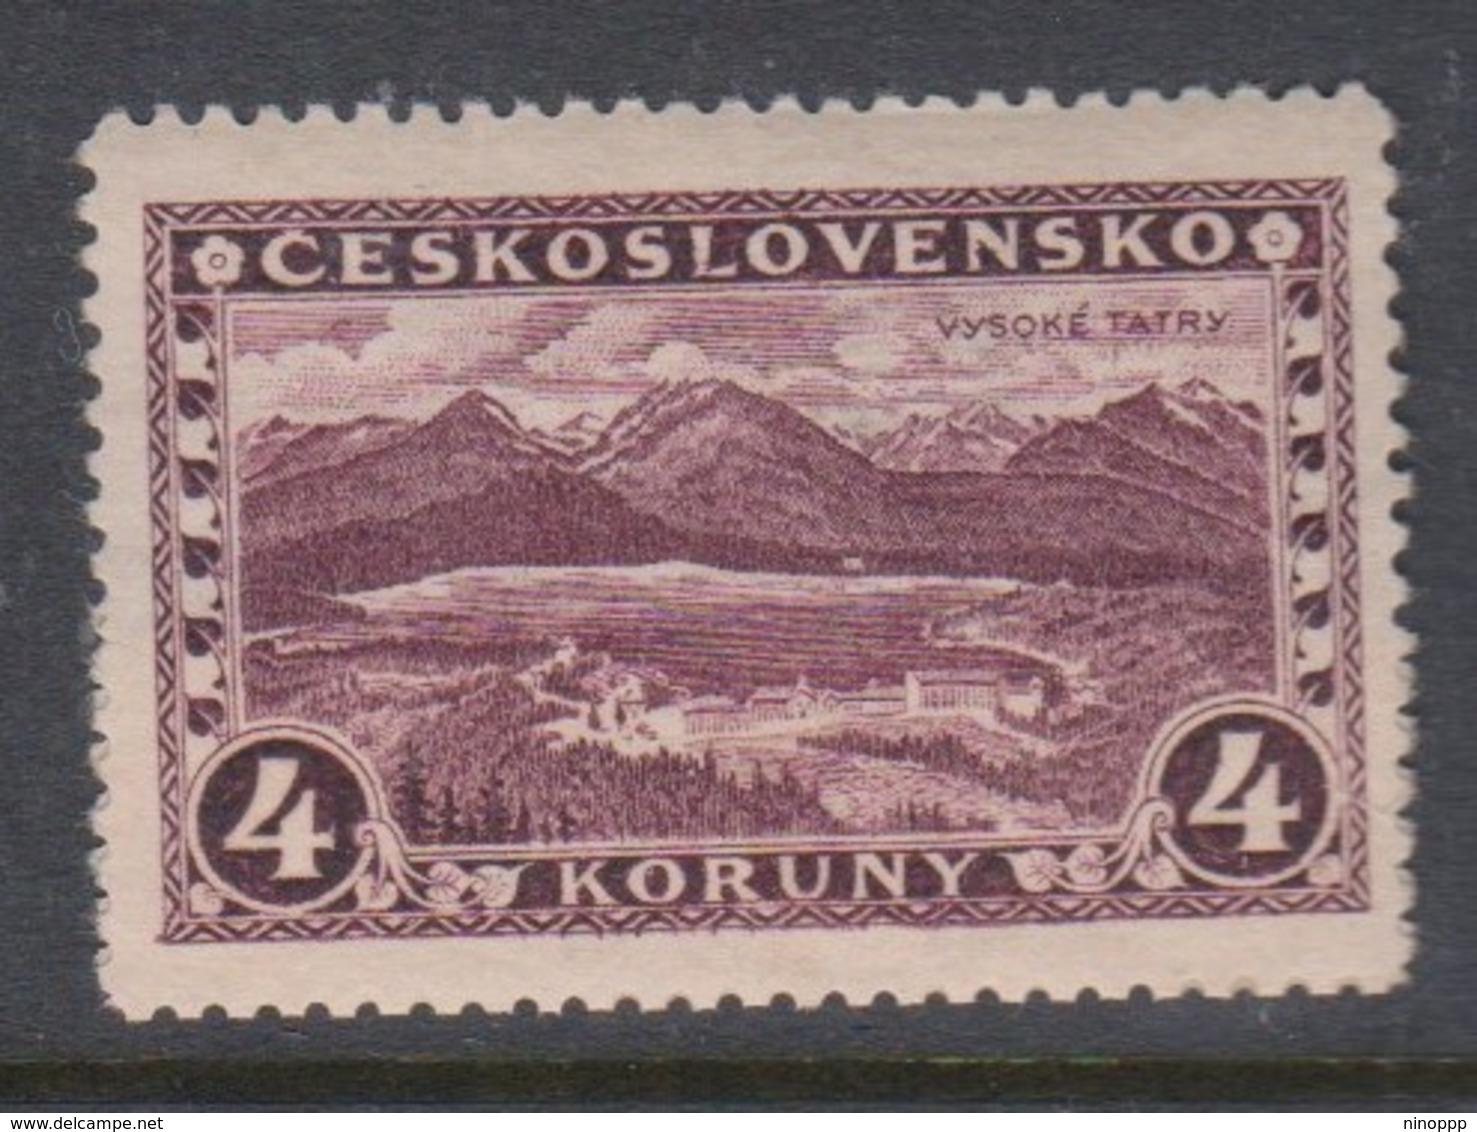 Czechoslovakia SG 276 1927 Great Tatra,4k Purple ,mint Never Hinged - Used Stamps